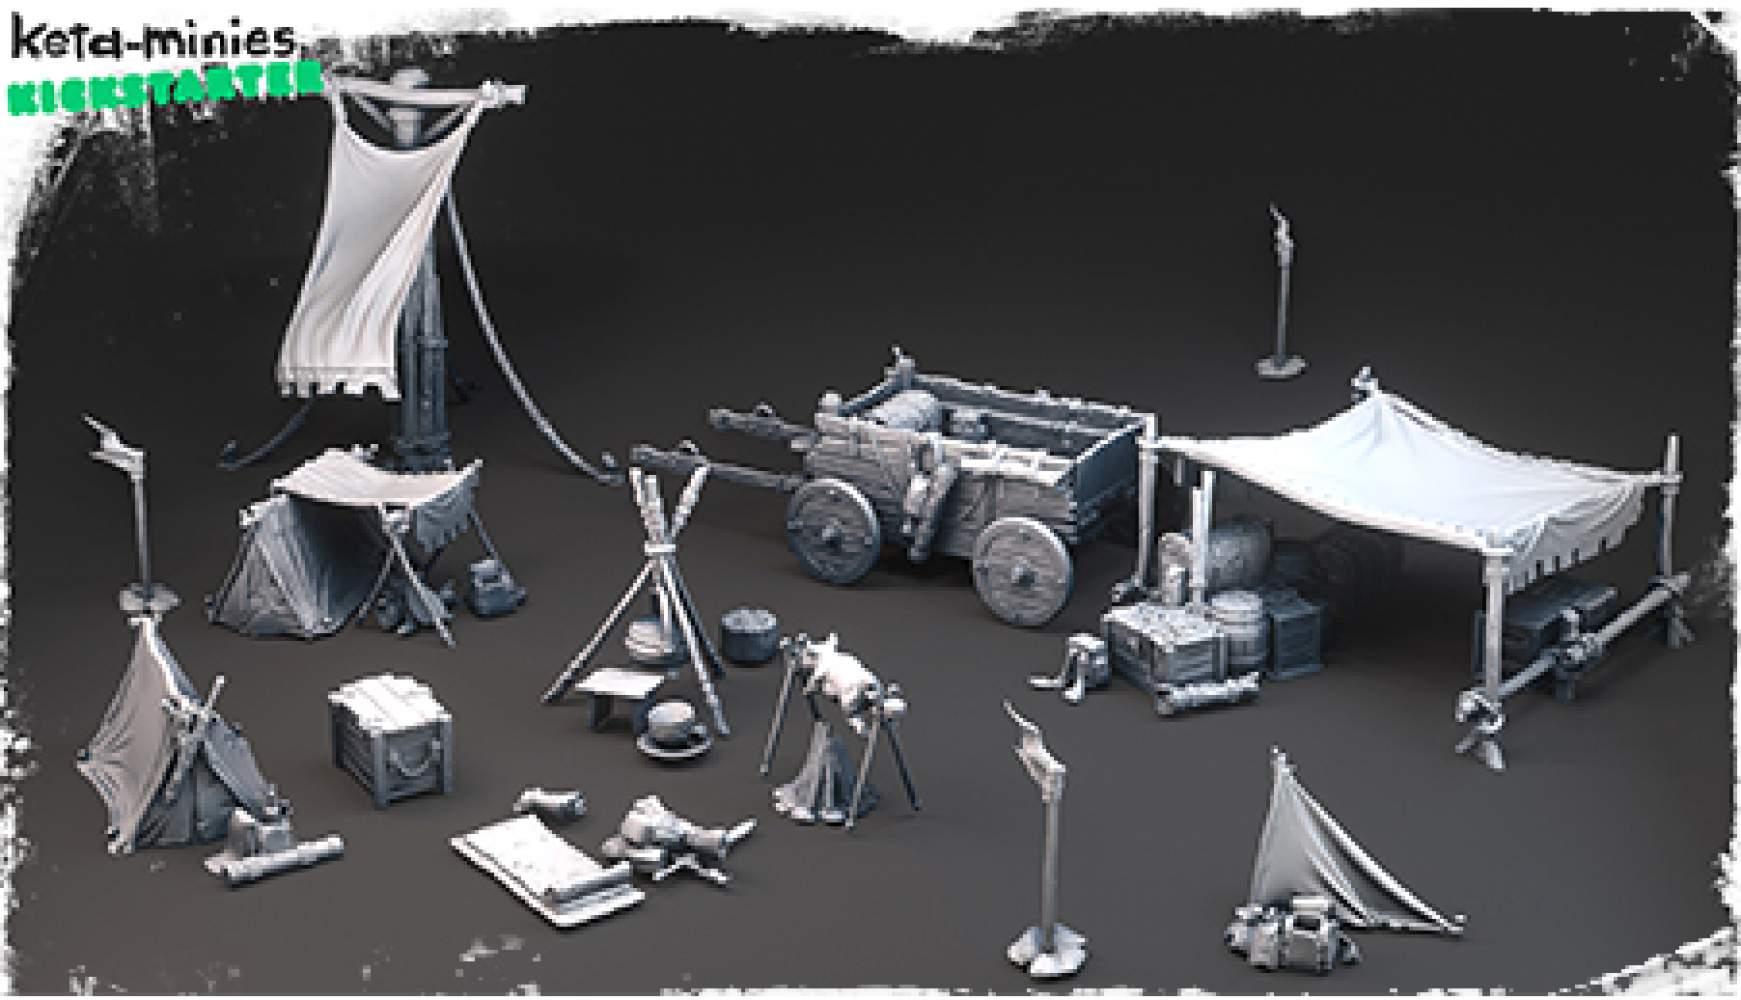 Keta Minies Kickstarter !  Printable STLs for Tabletop Games